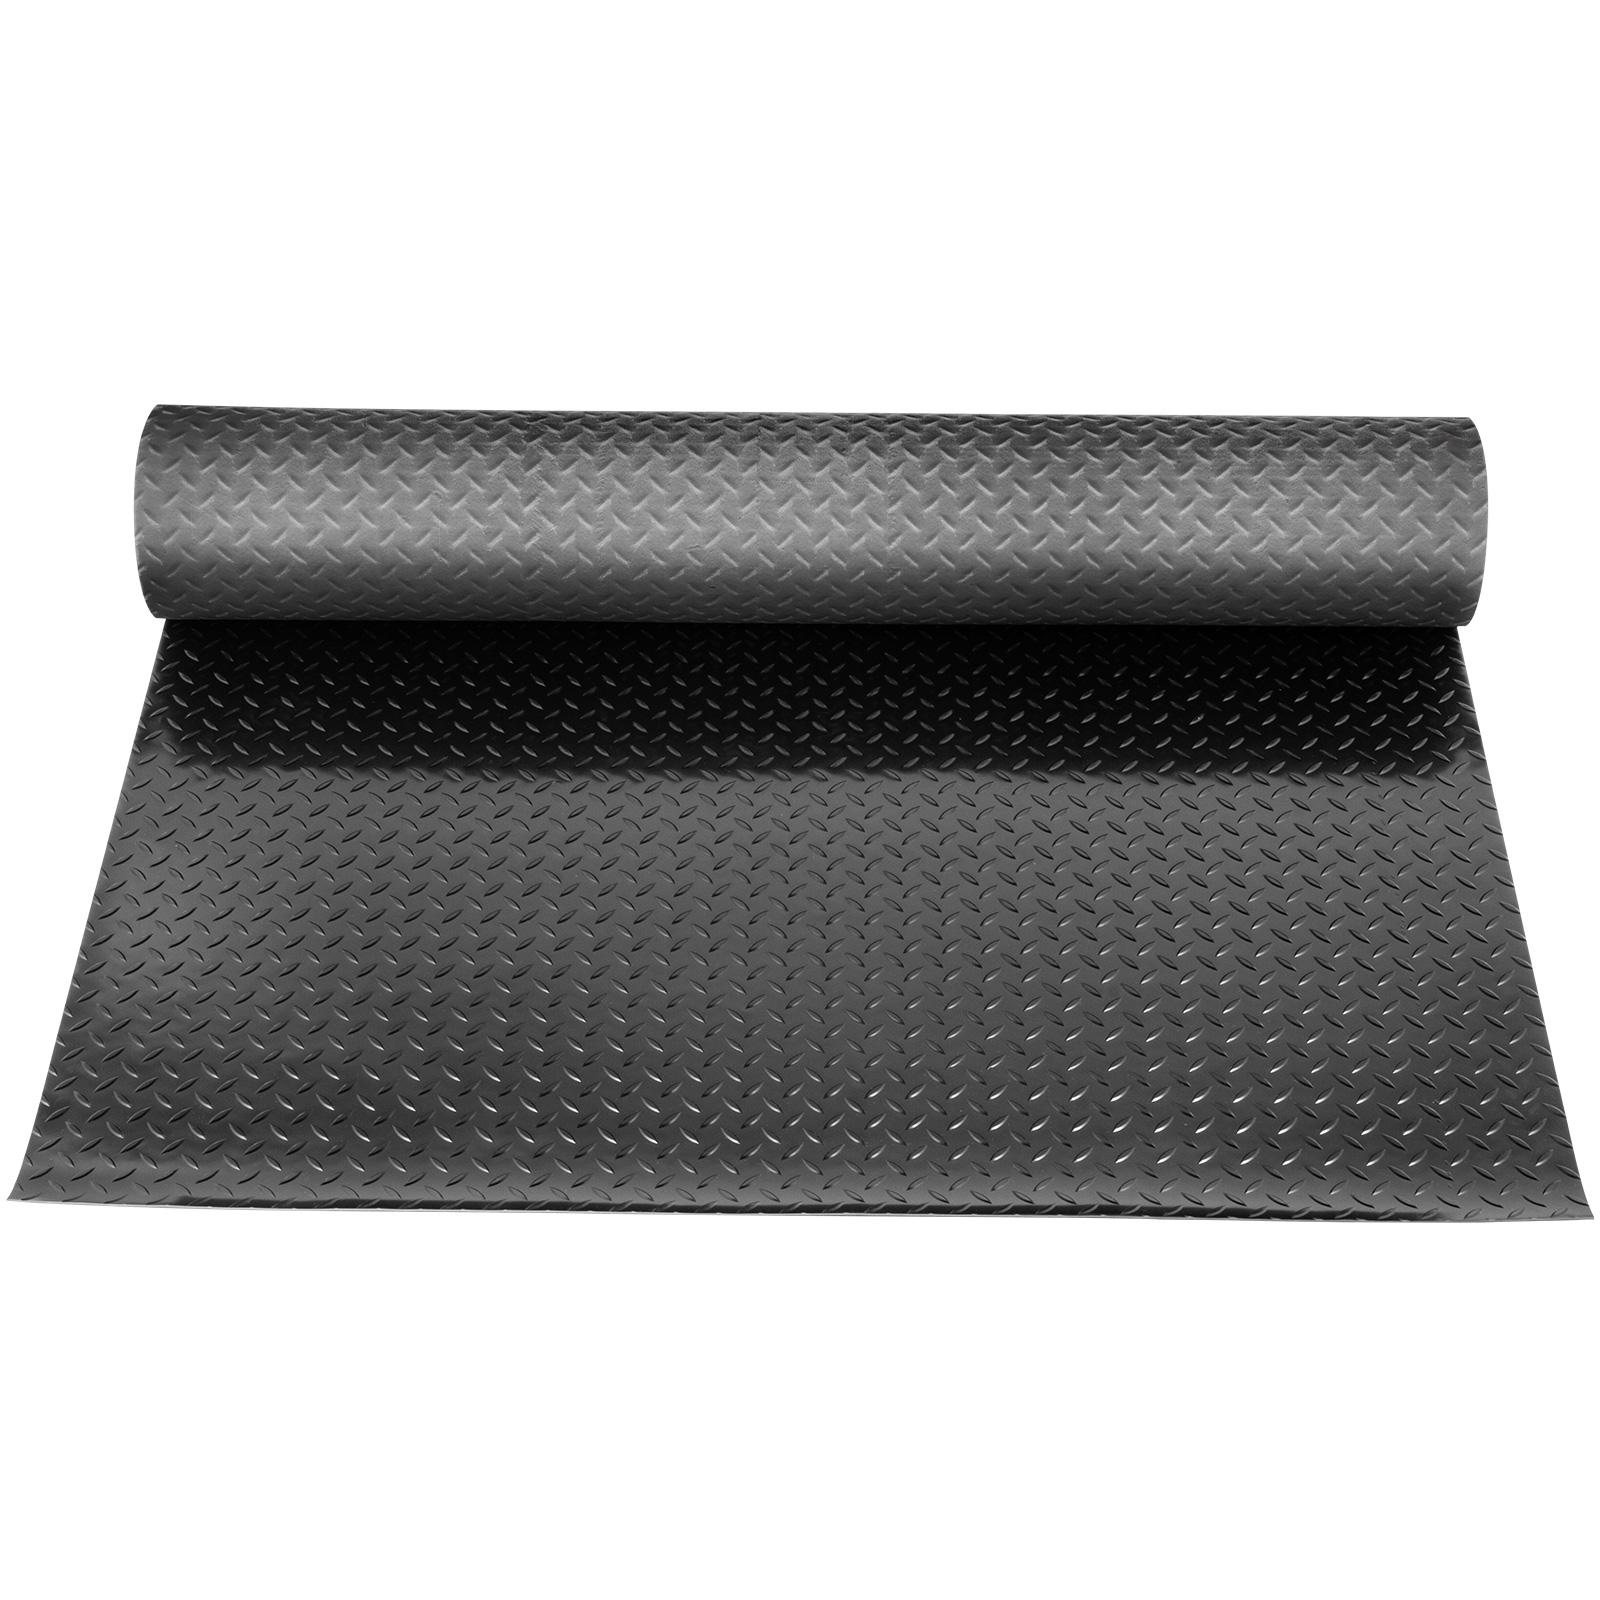 thumbnail 132 - Garage Flooring Mat Roll Car Trailer Floor Covering 1.1m Width Gym Floor Roll